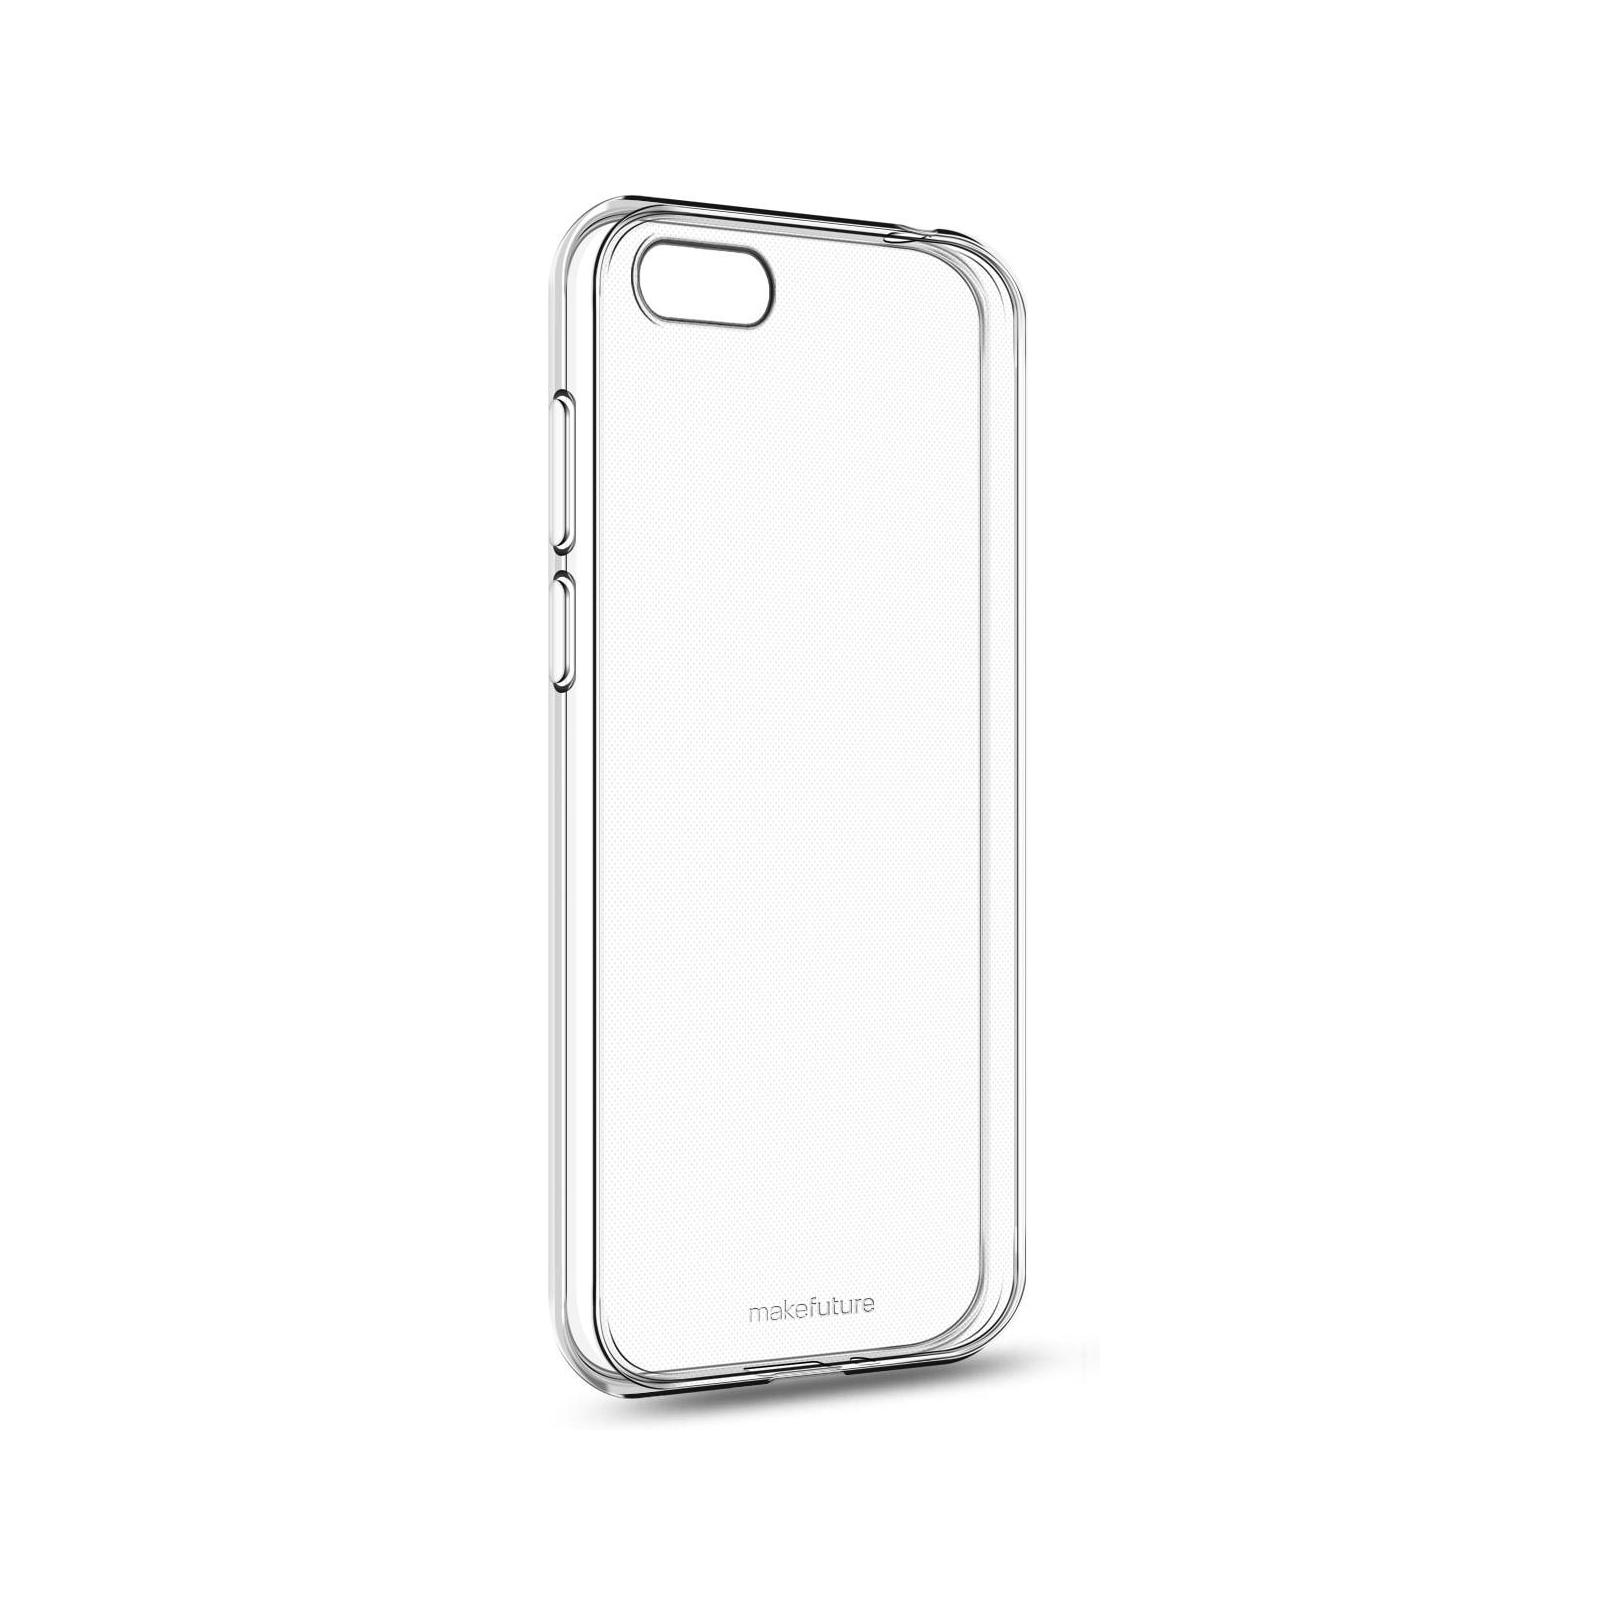 Чехол для моб. телефона MakeFuture Air Case (Clear TPU) Huawei Y6 2018 (MCA-HUY618)